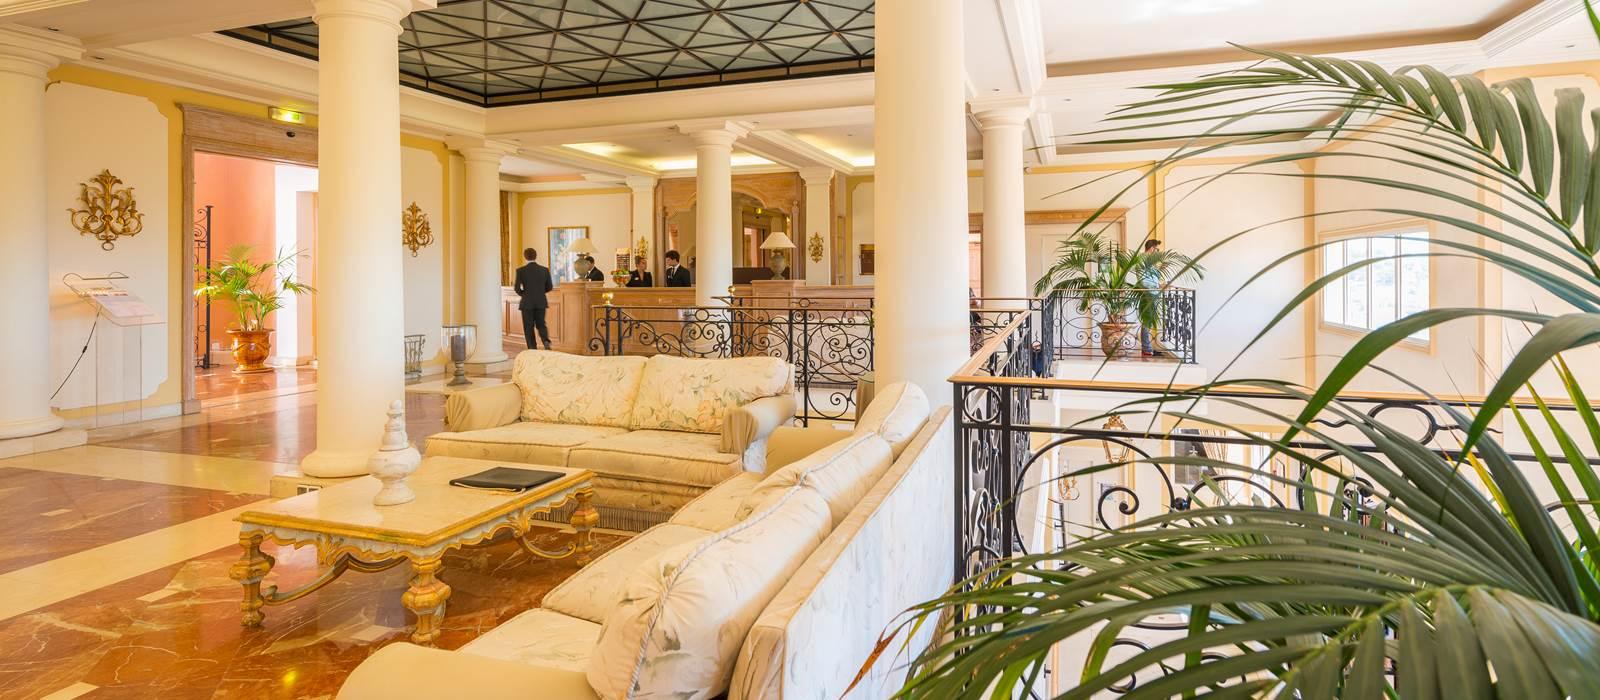 Hotel Cannes Piscine Interieure